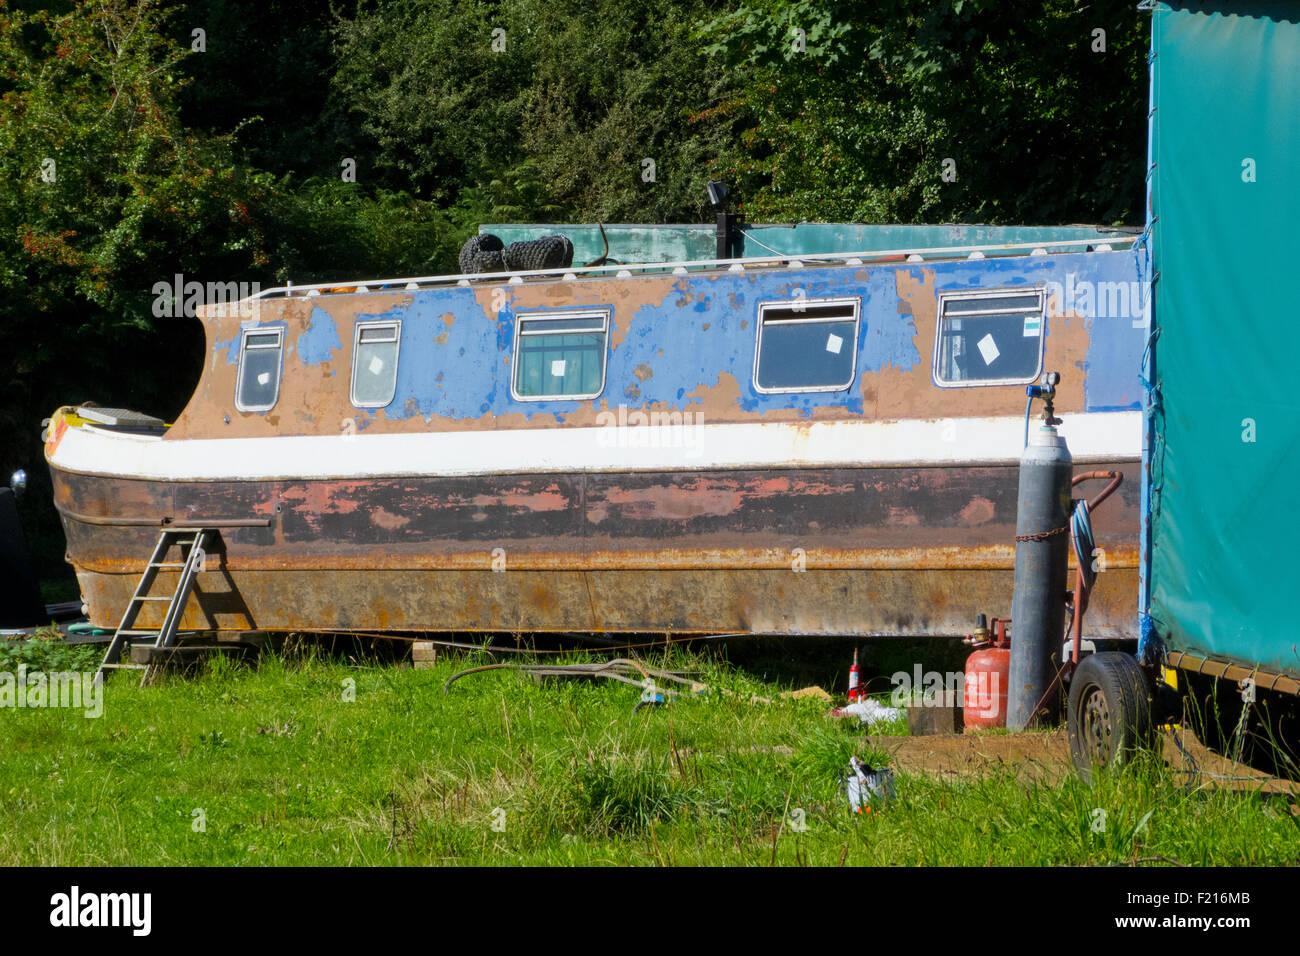 Narrowboat in Dry Dock Undergoing Repair Work, Stourbridge Canal, Staffordshire, England, UK Stock Photo